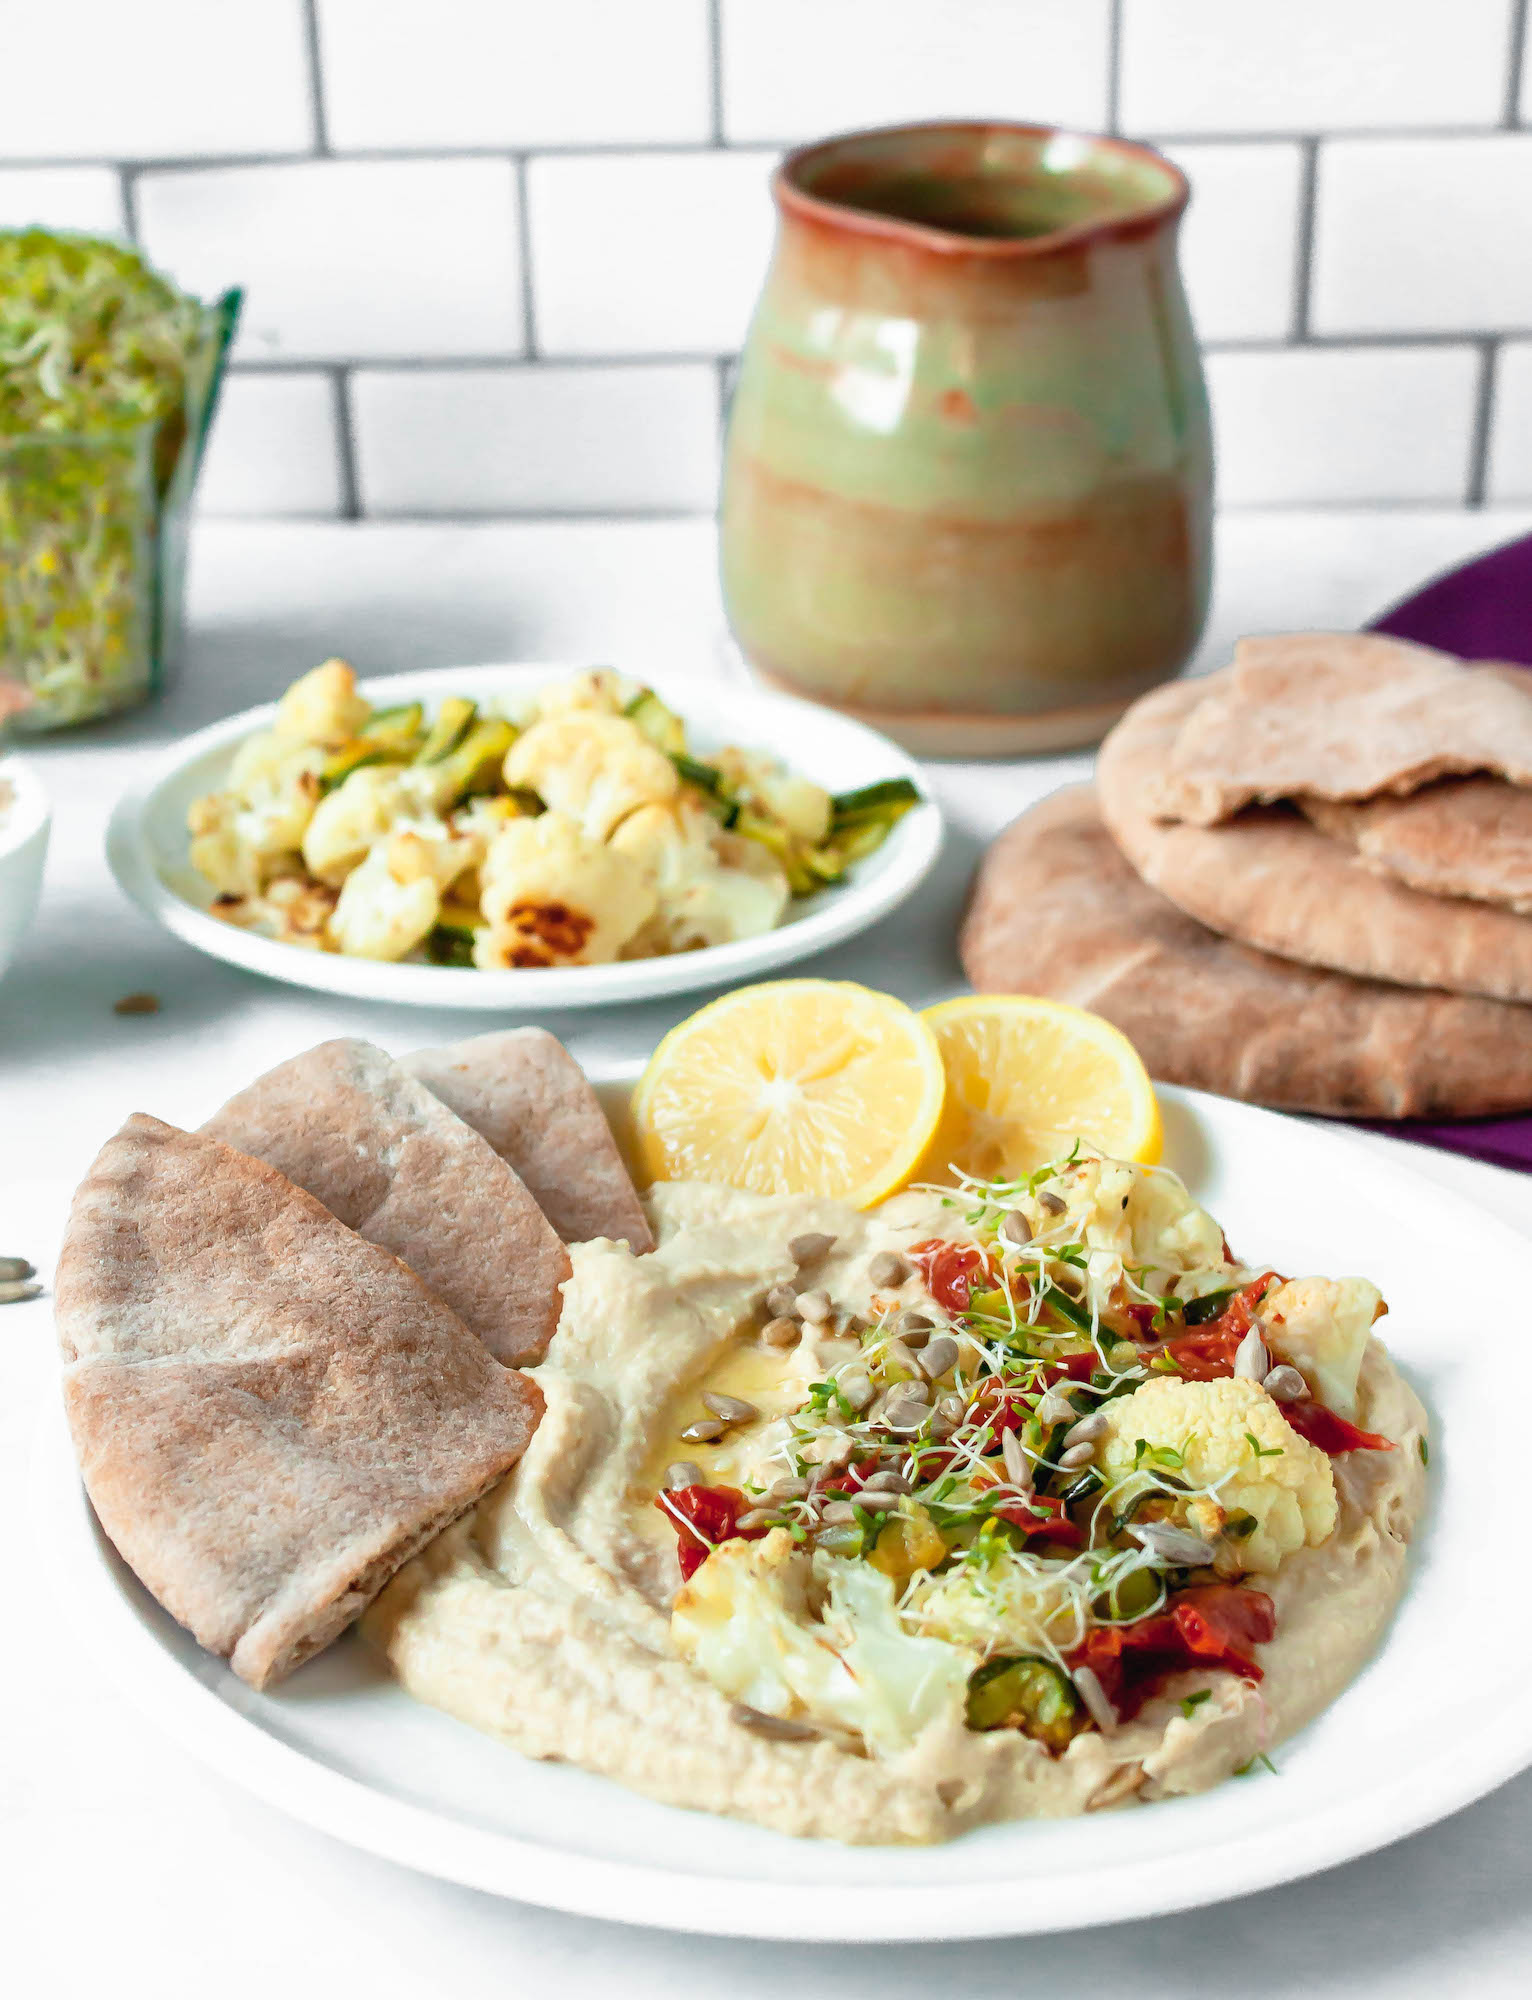 sunflower seed veggie hummus bowl | food blog | hearth health happiness